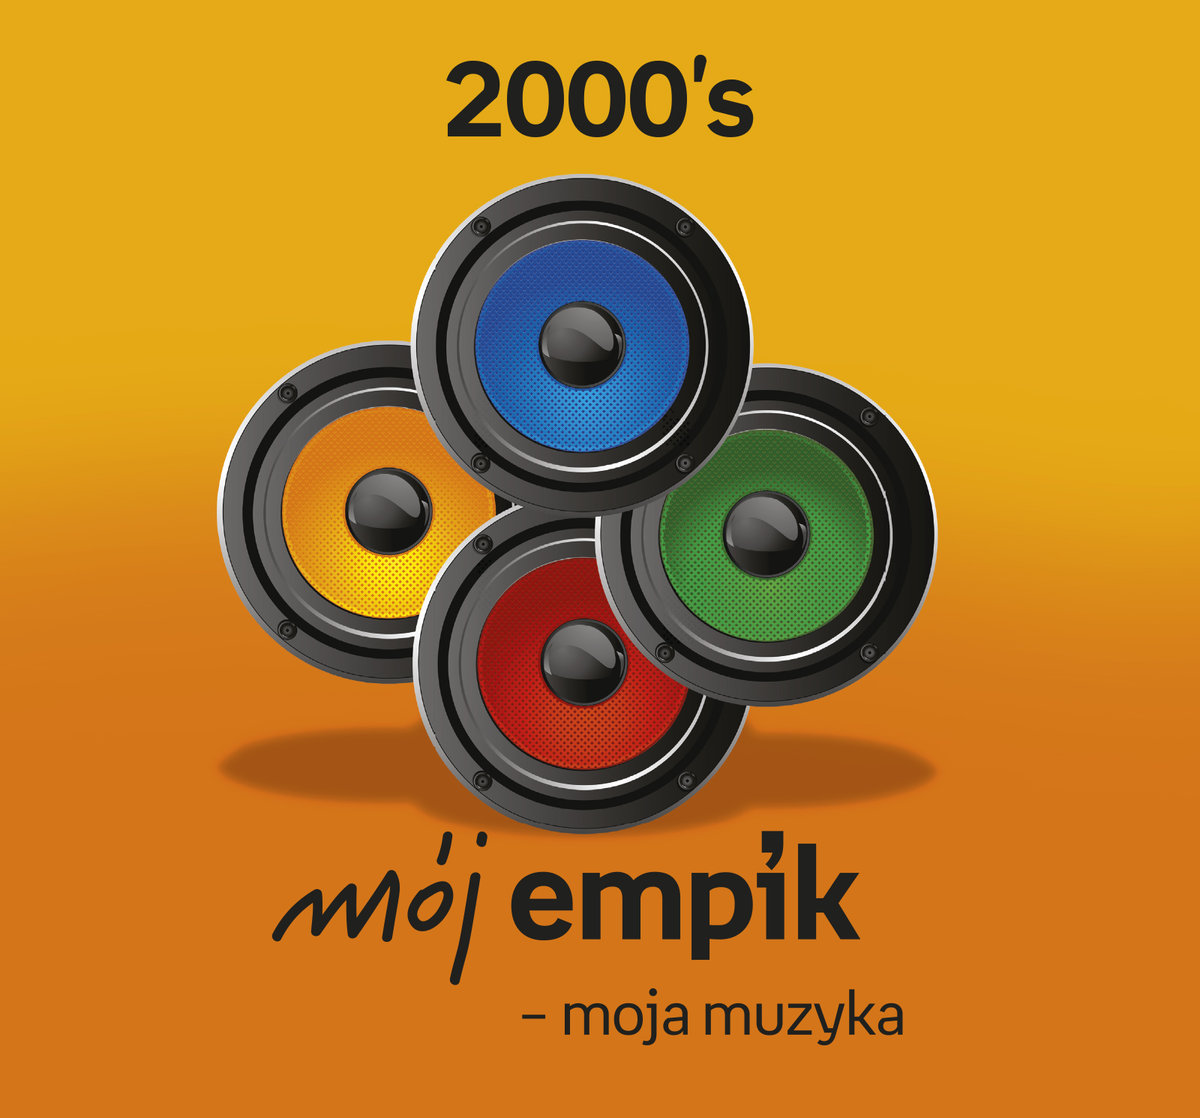 Mój Empik - Moja Muzyka 2000's